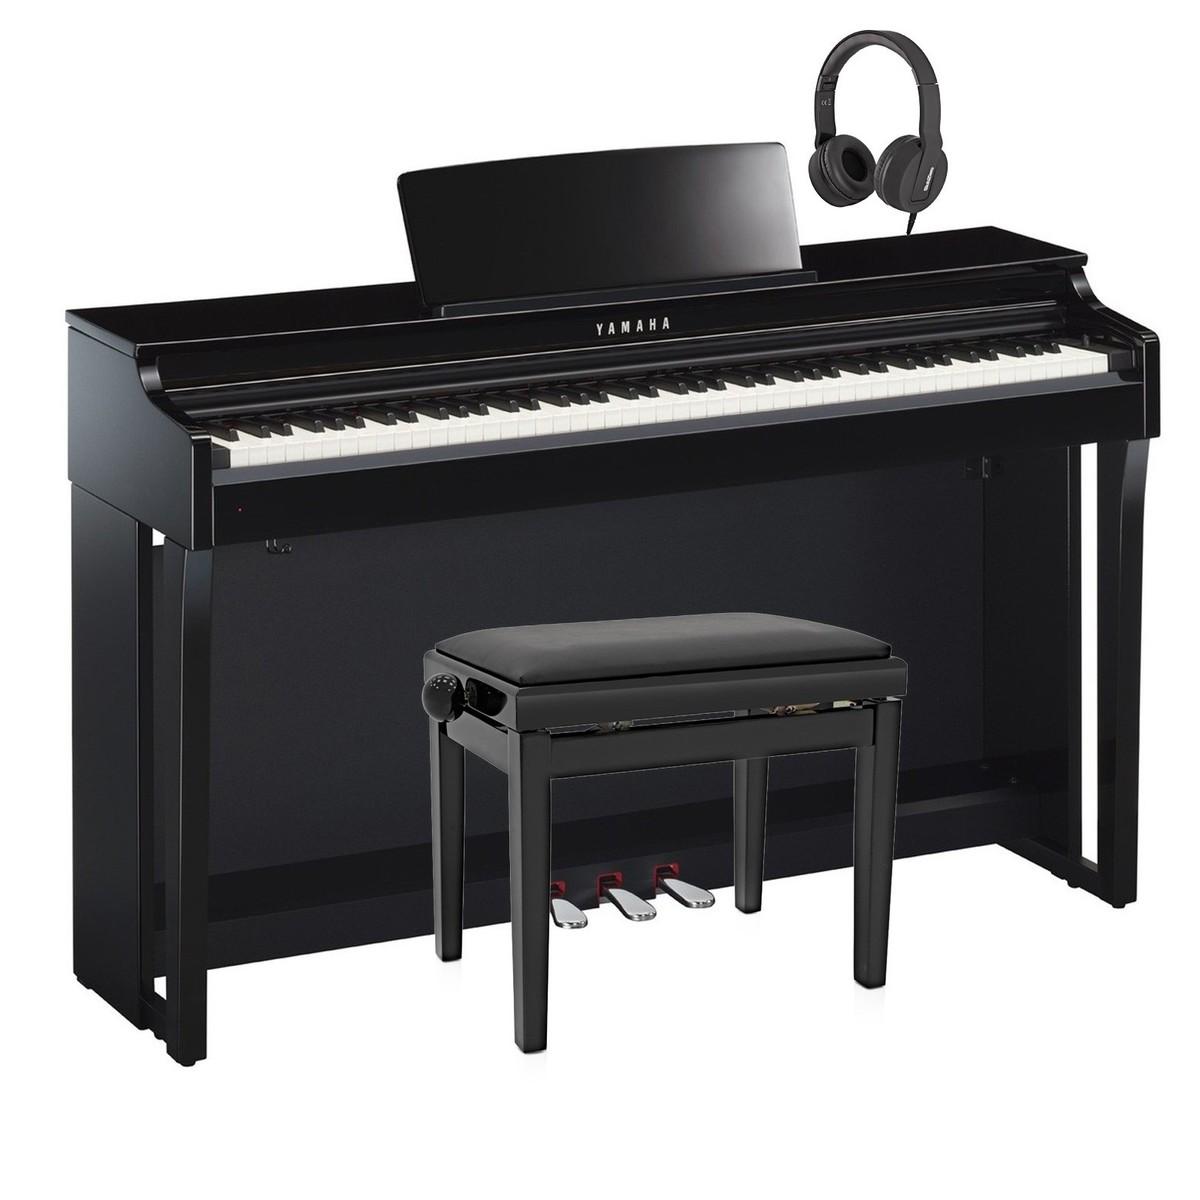 yamaha clp 625 digital piano package polished ebony at. Black Bedroom Furniture Sets. Home Design Ideas